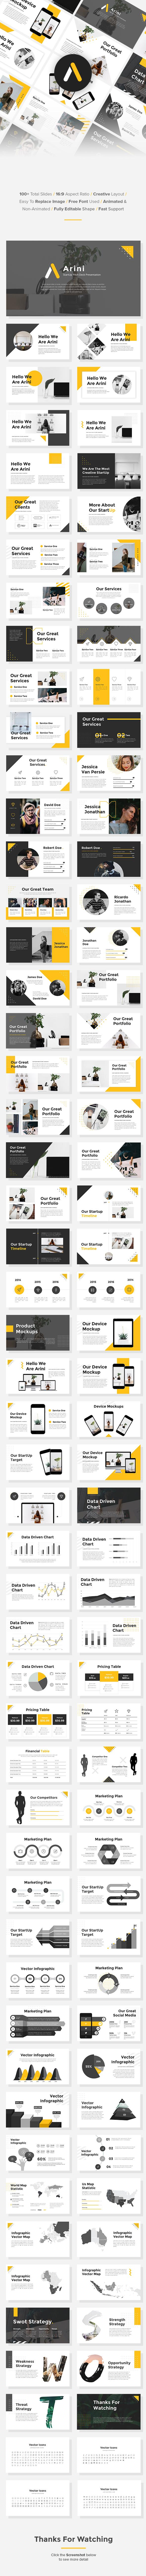 Arini - StartUp Pitch Deck Keynote Template - Keynote Templates Presentation Templates